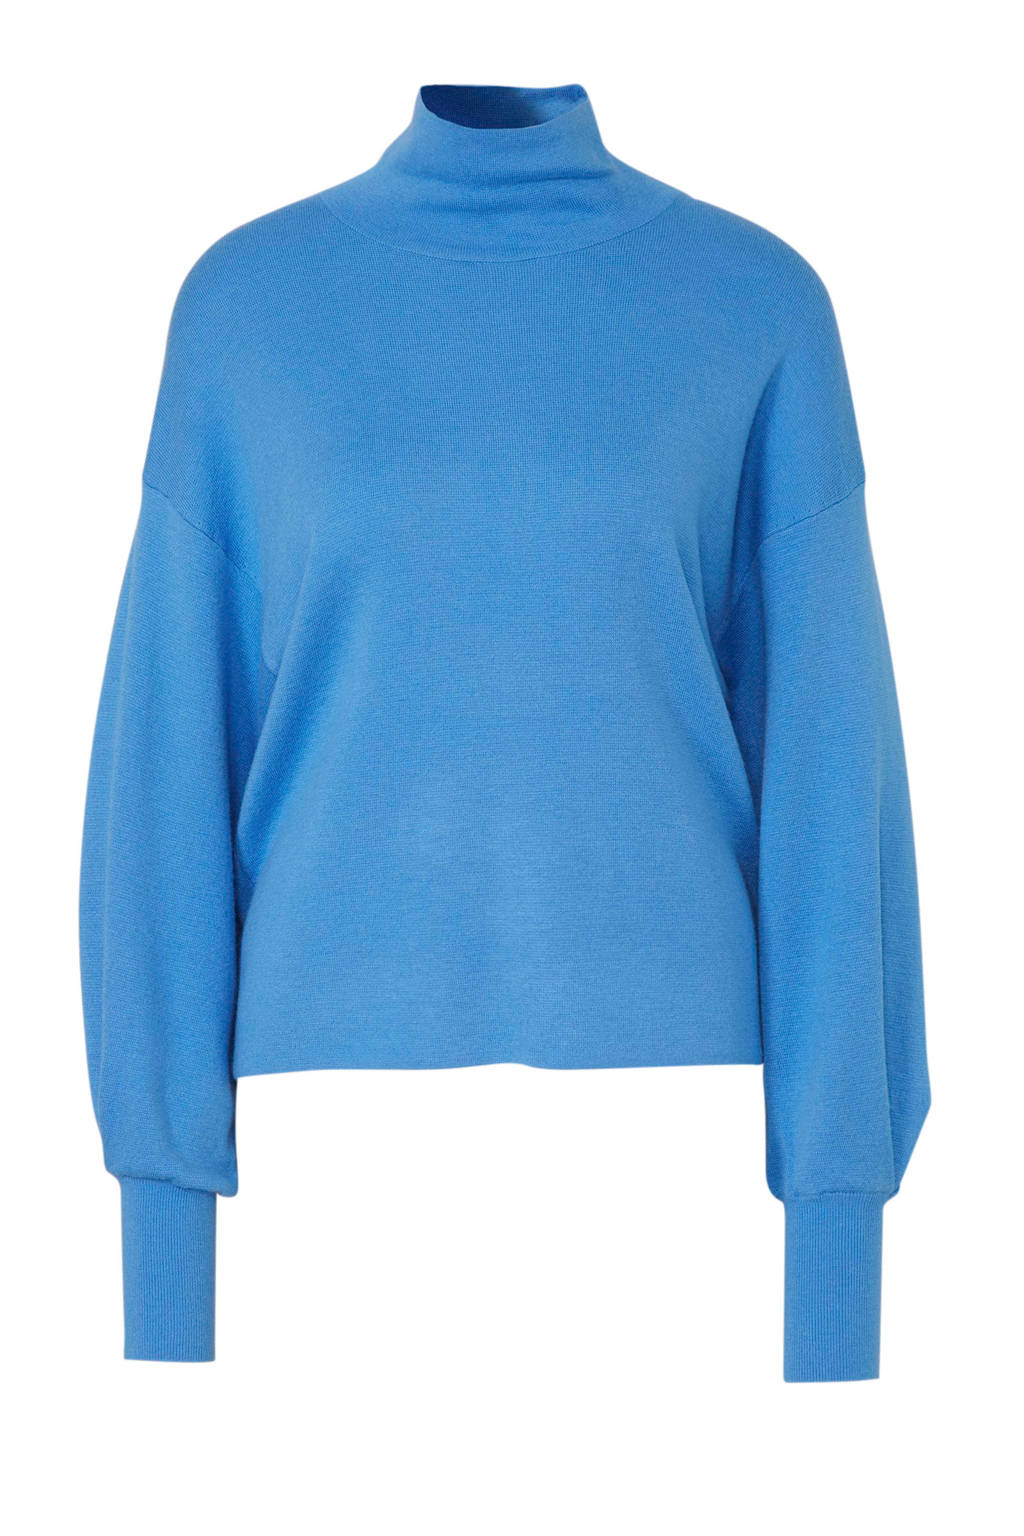 Inwear coltrui blauw, Blauw